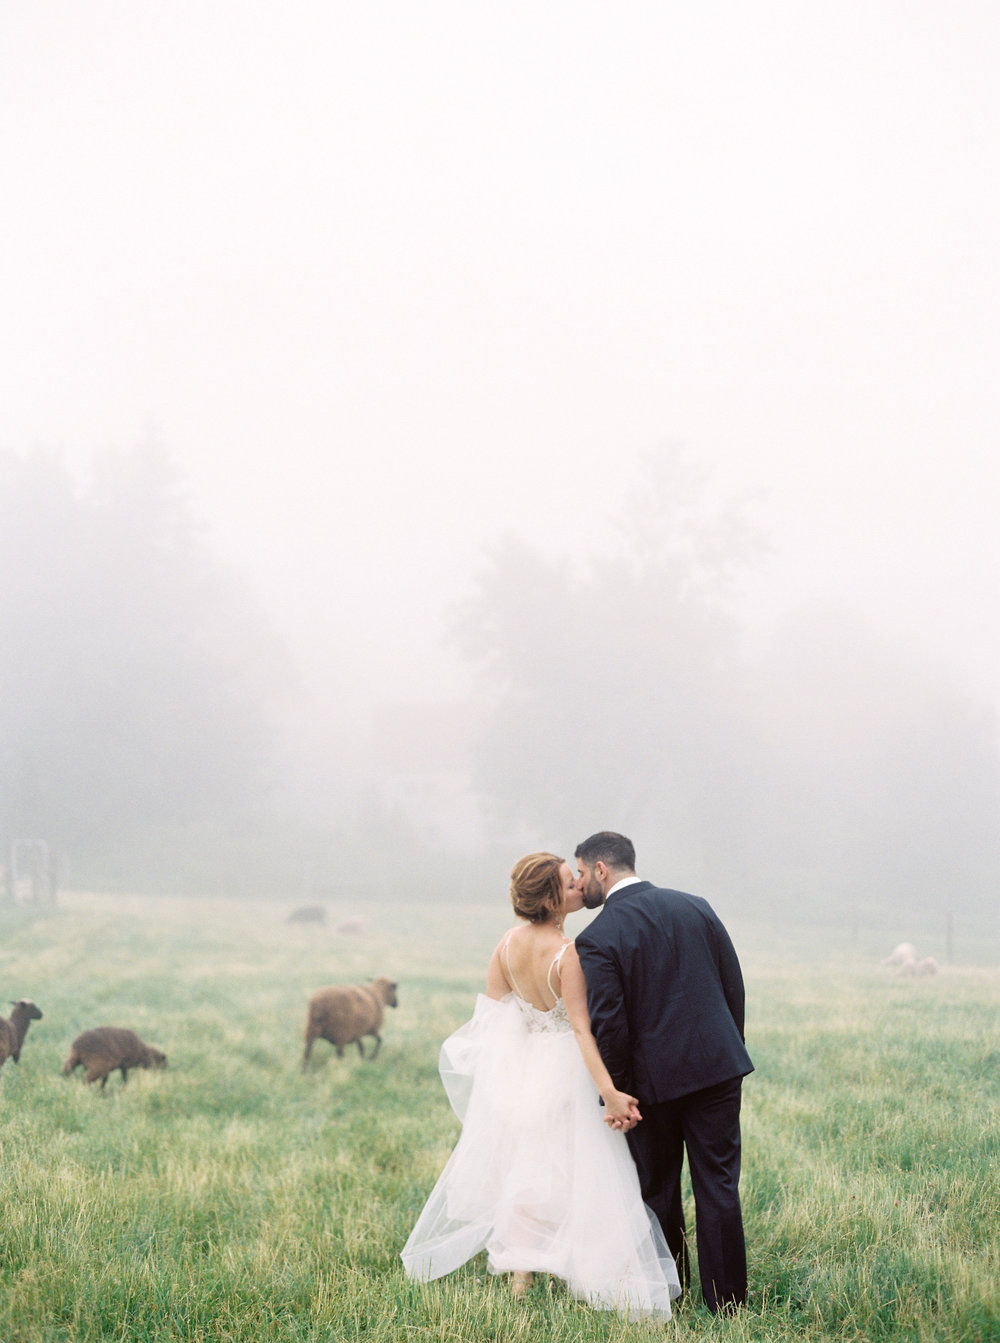 Photography: Alicia Ann Photographers